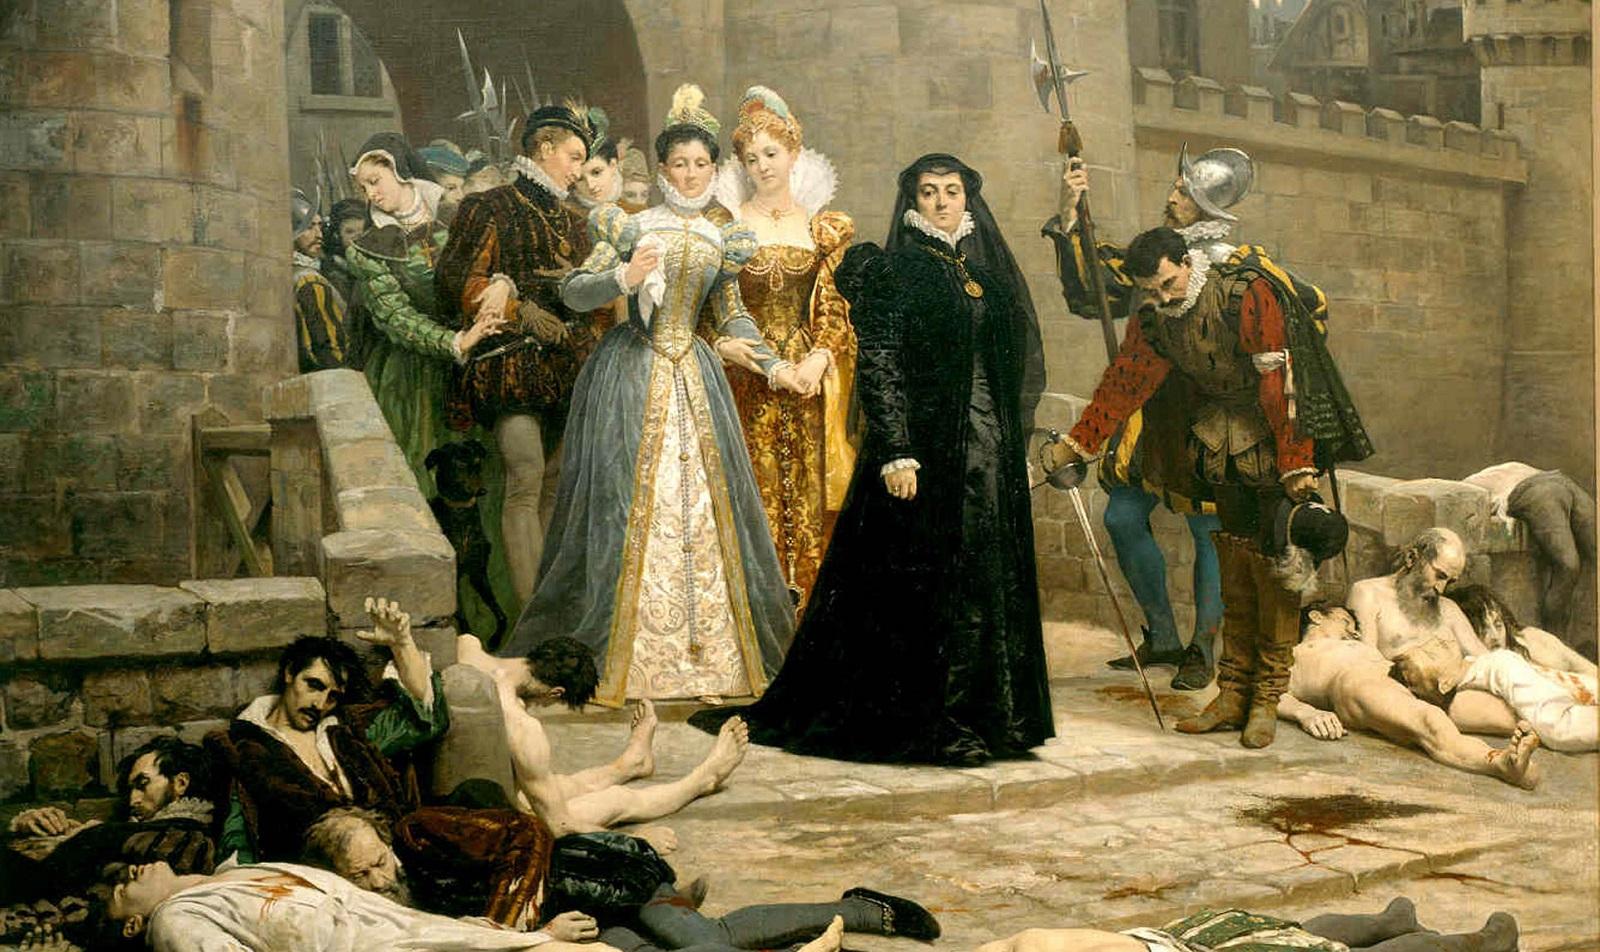 «Утро у ворот Лувра» кисти Эдуара Деба-Понсан, 1880 год.